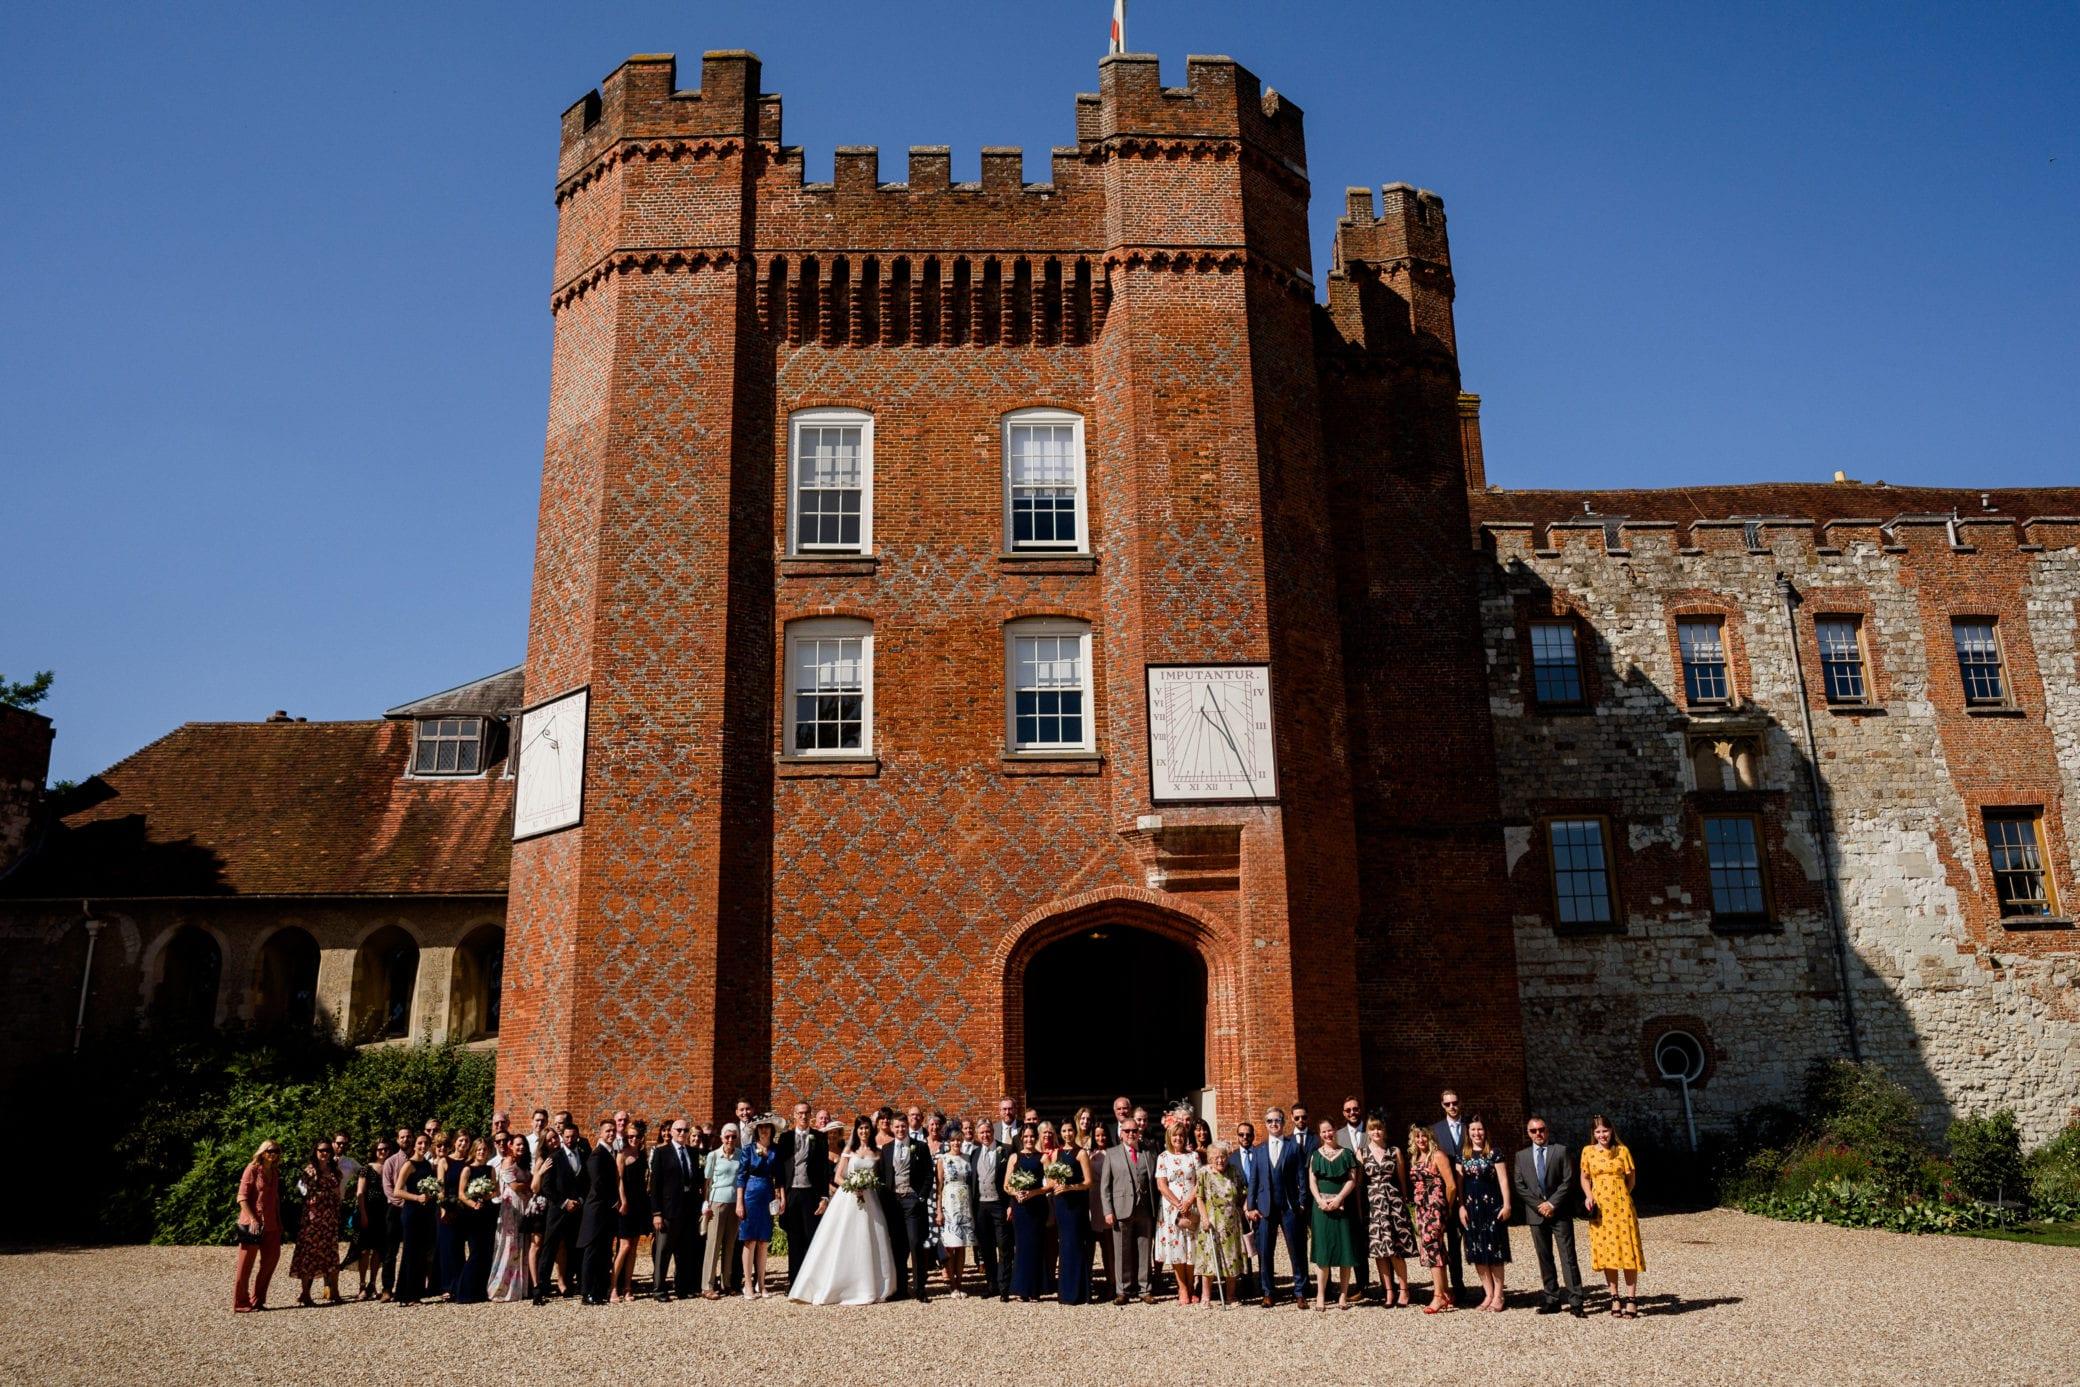 Wedding guests standing in front of Farnham Castle